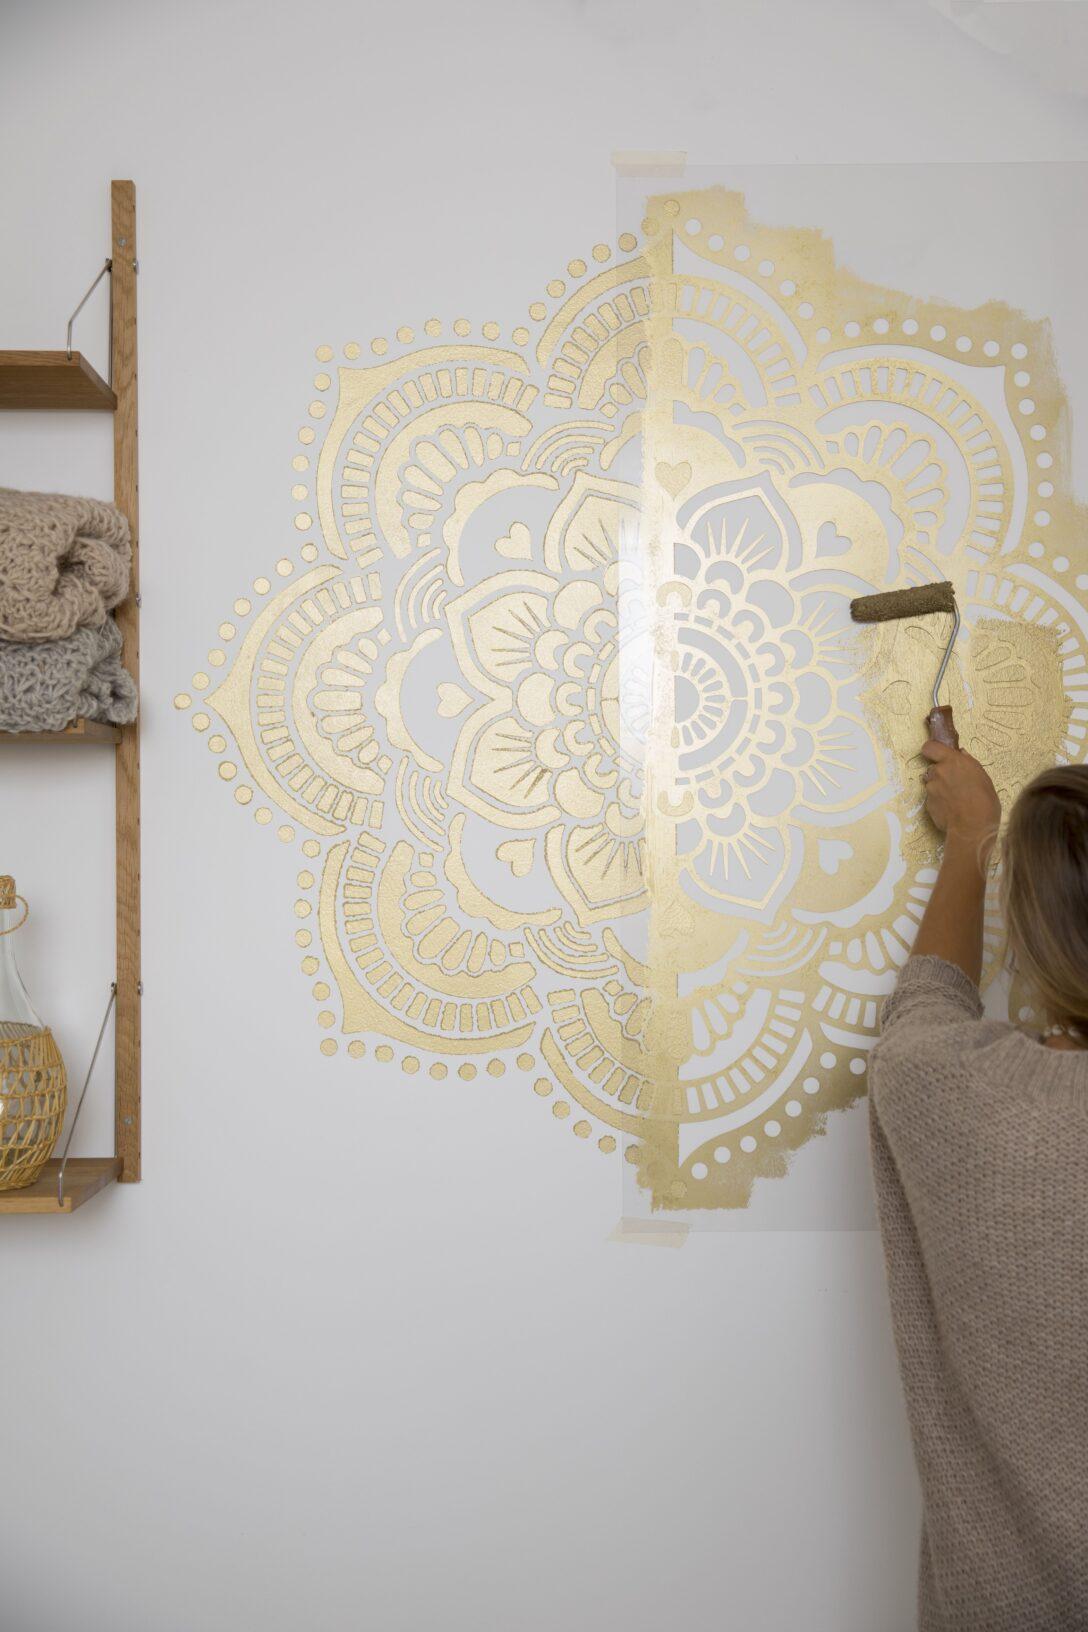 Large Size of Make A Golden Yoga Mandala 118 By Cmstep Step Regal Kinderzimmer Weiß Sofa Regale Kinderzimmer Wandschablonen Kinderzimmer